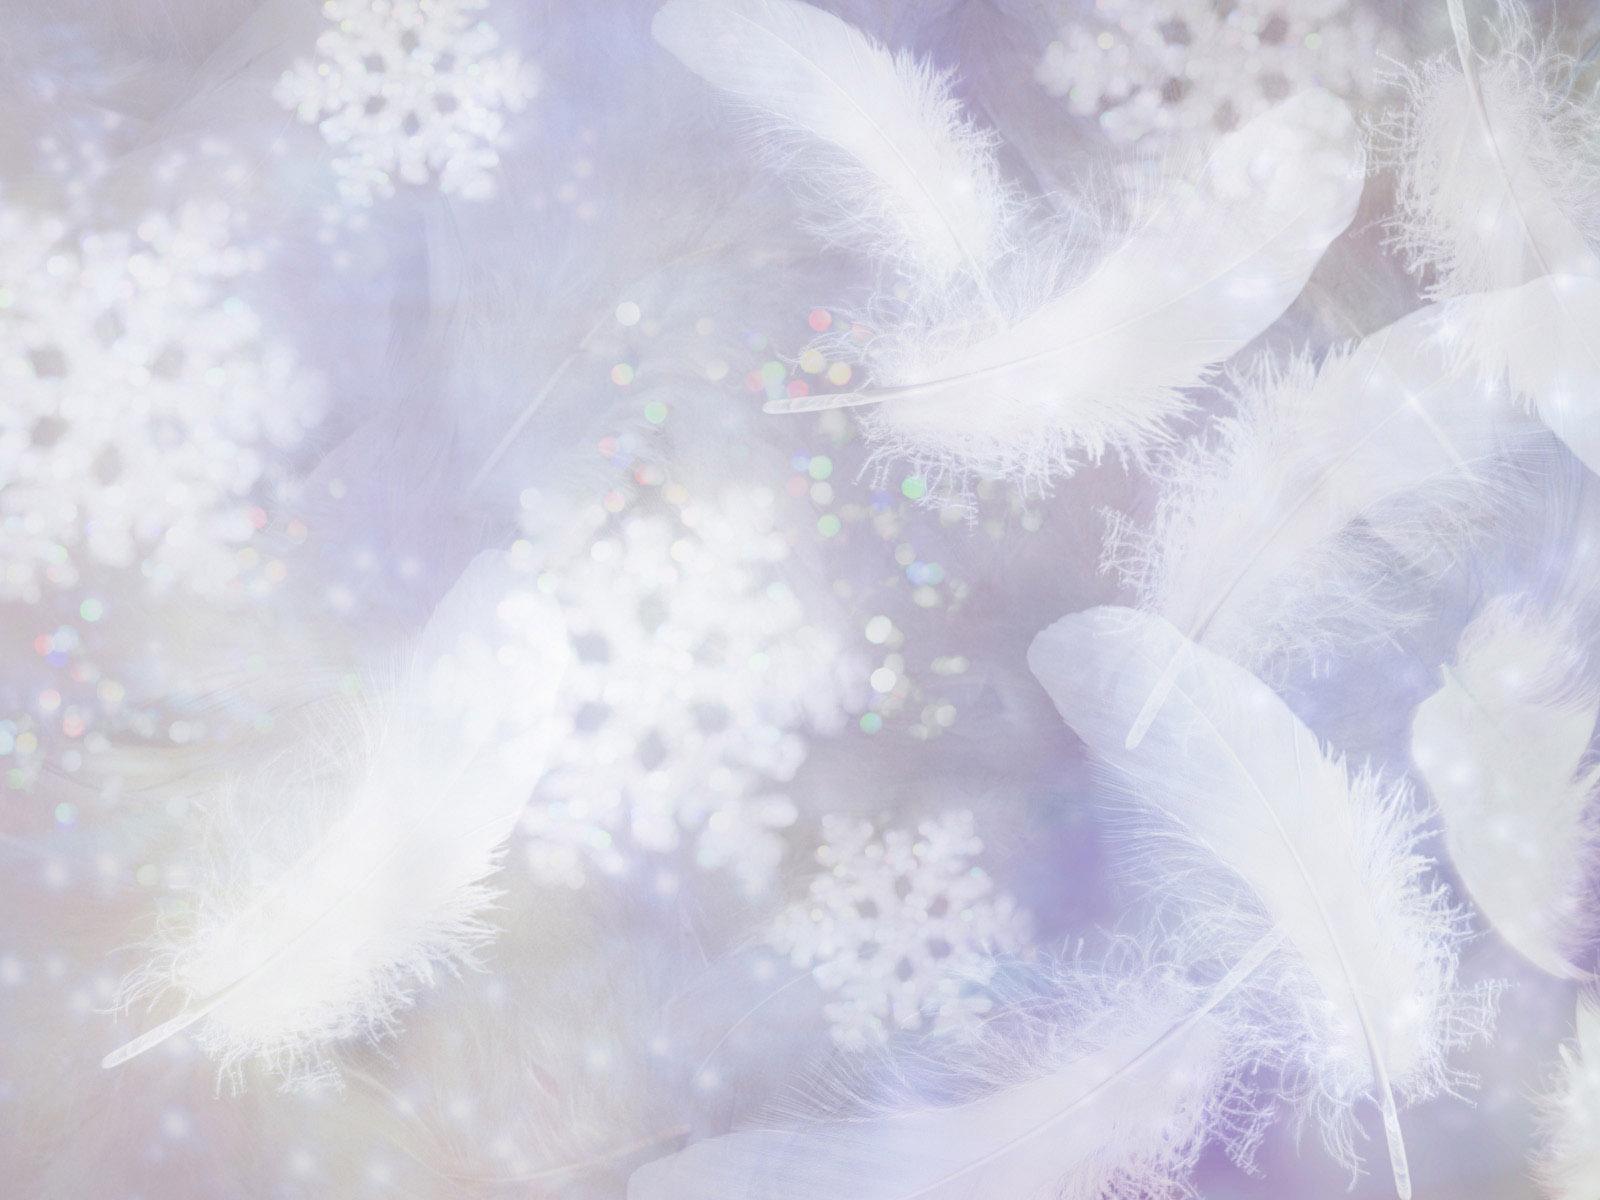 Зима новый год